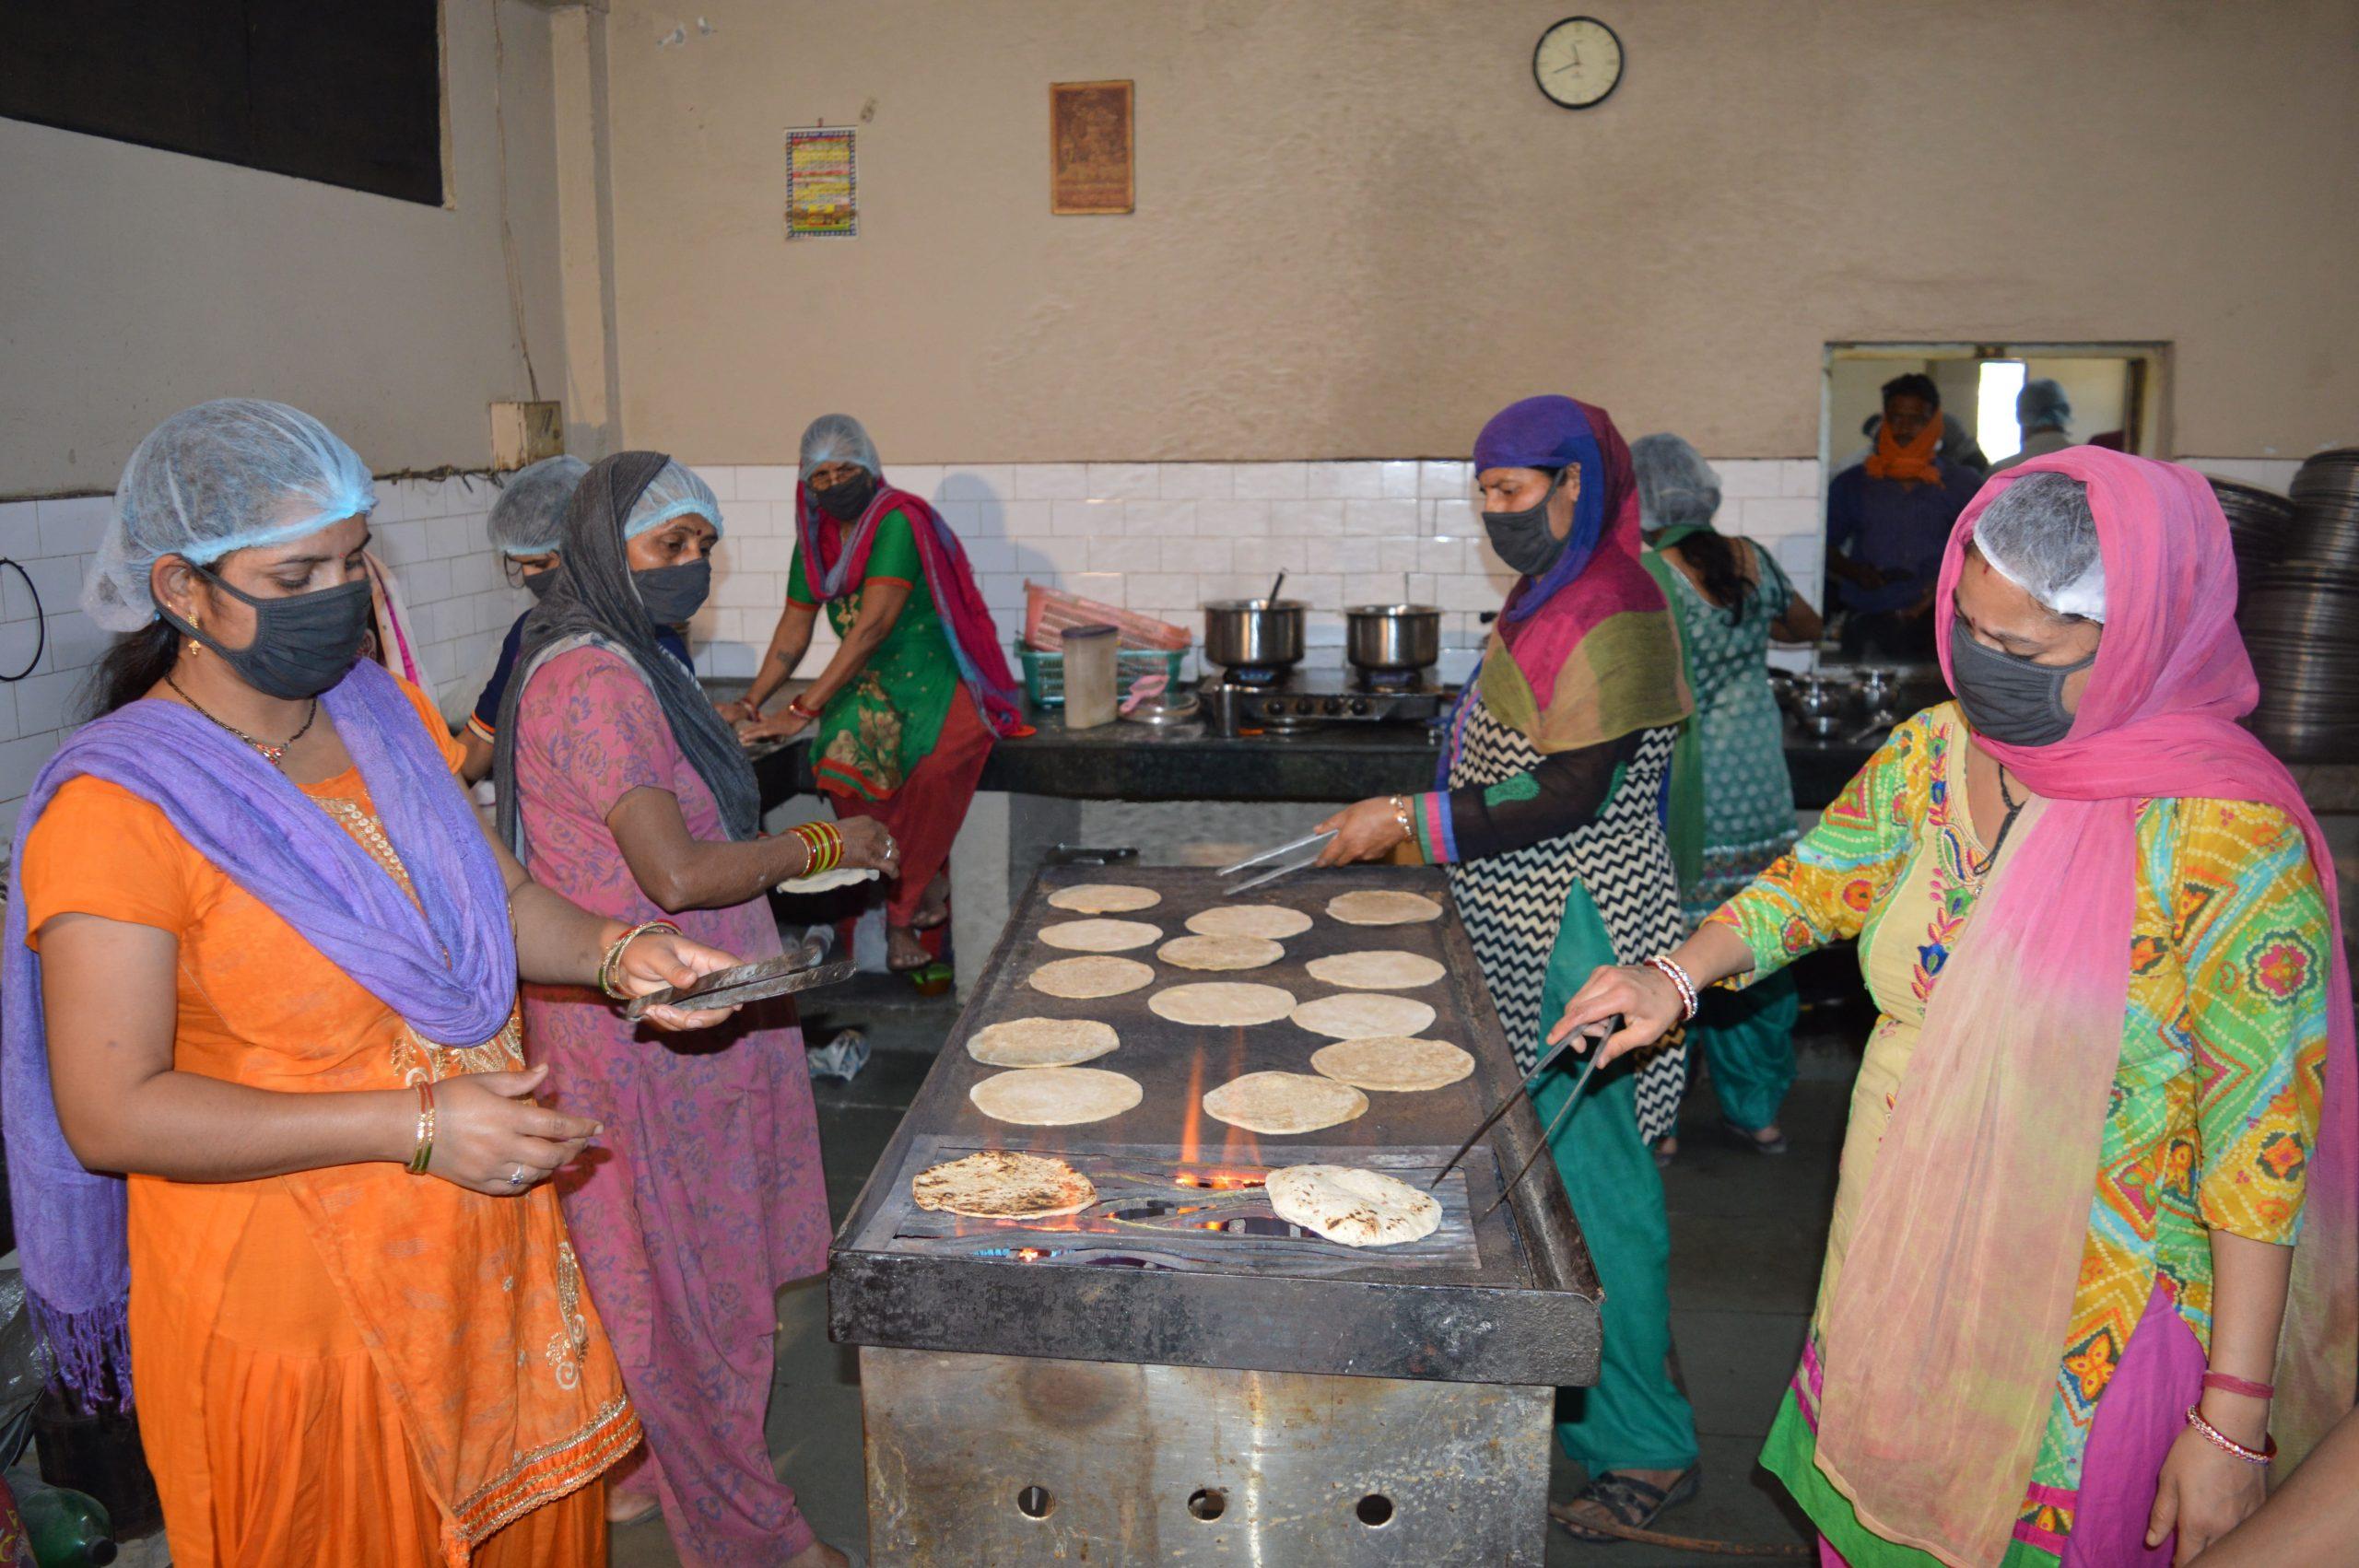 Cooking Food in Faridabad